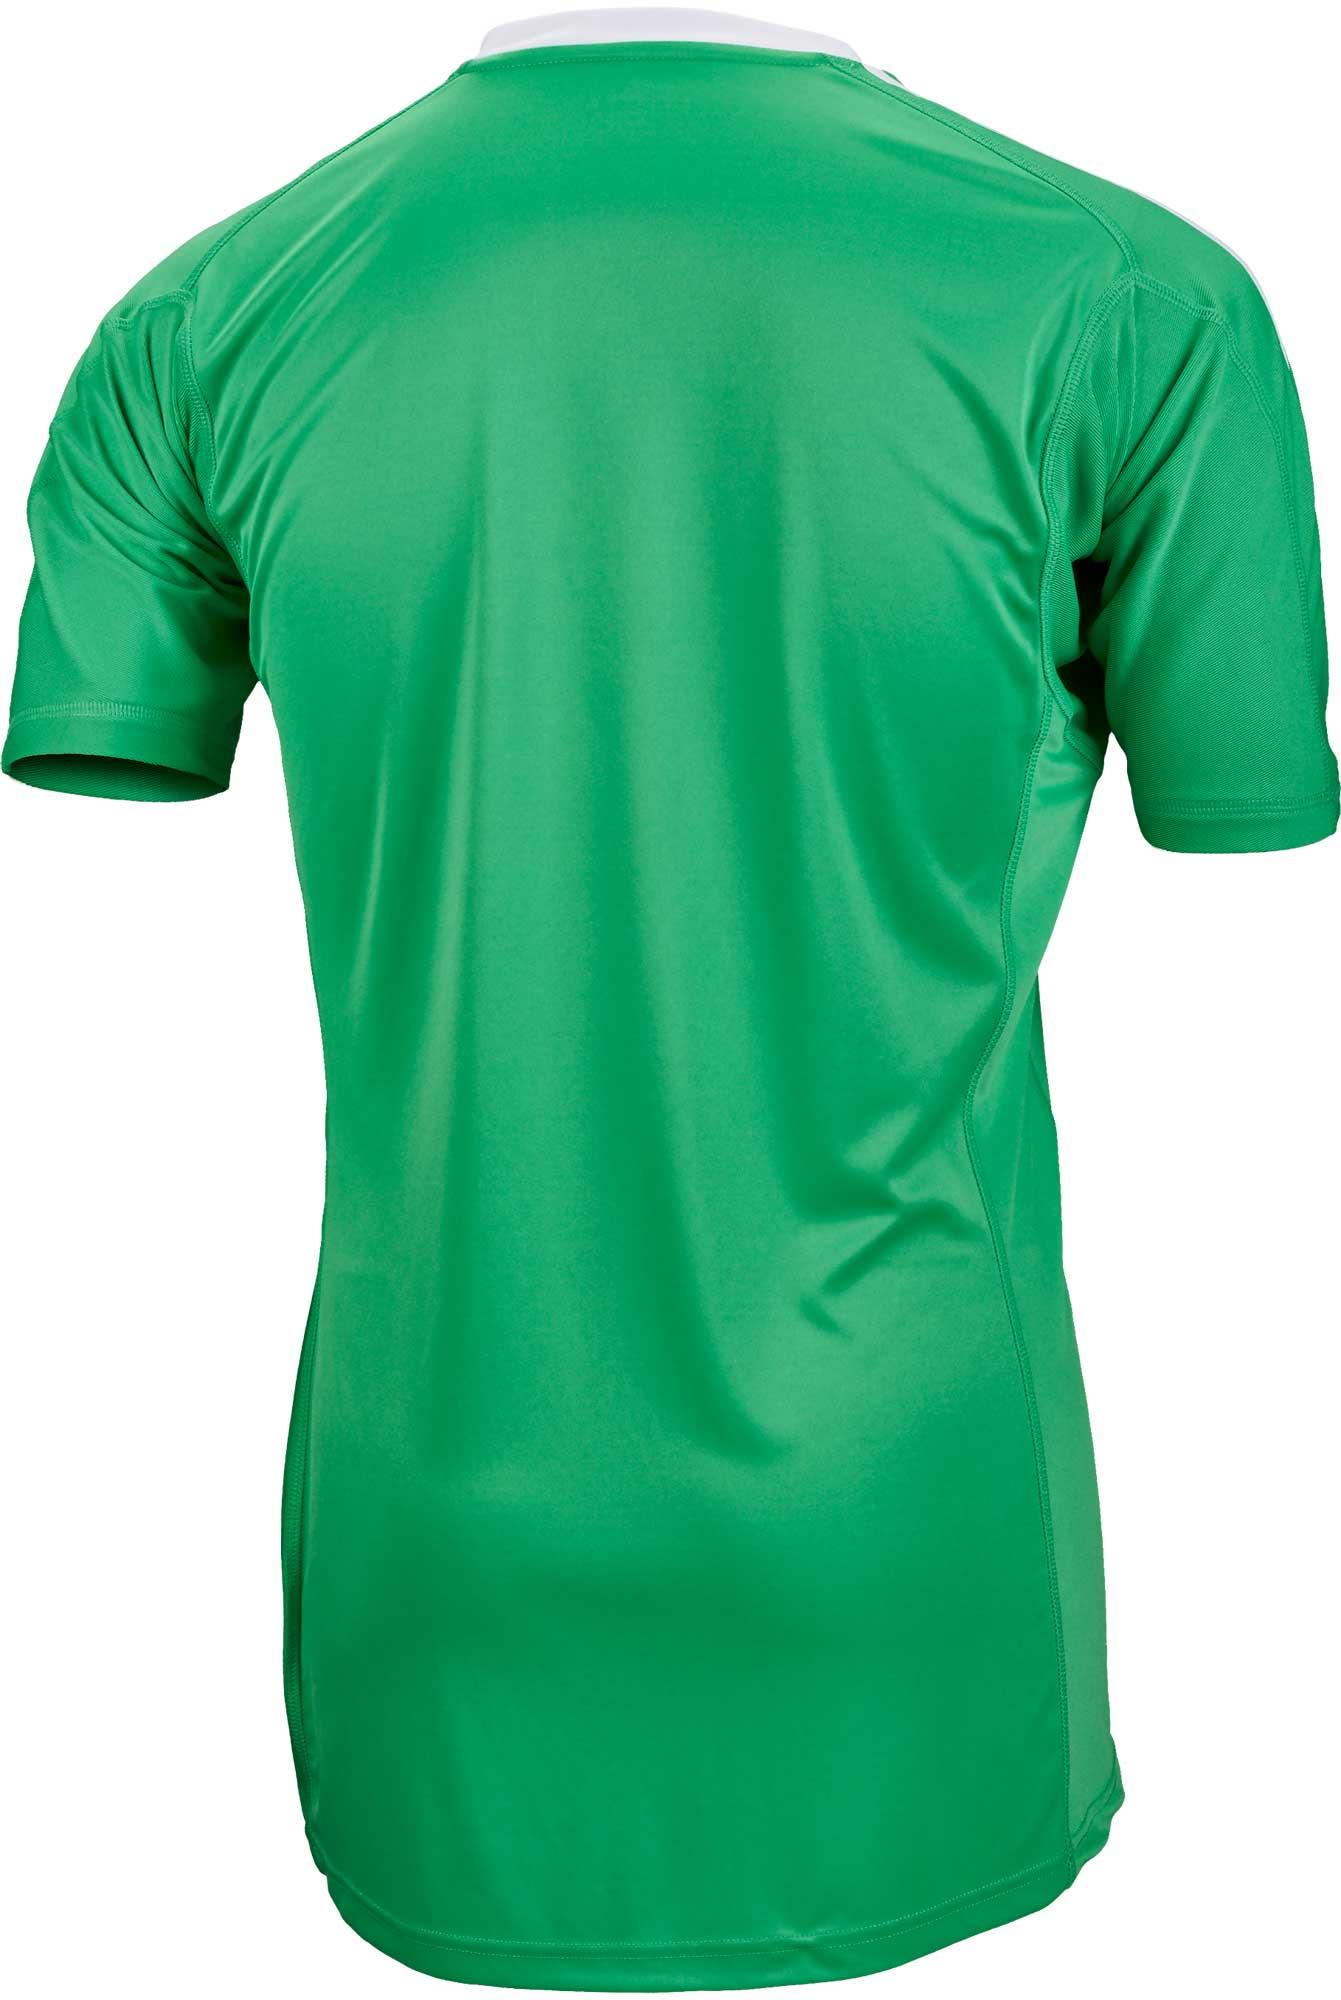 f49f8b88c adidas Revigo 17 S S Goalkeeper Jersey - Energy Green   White ...